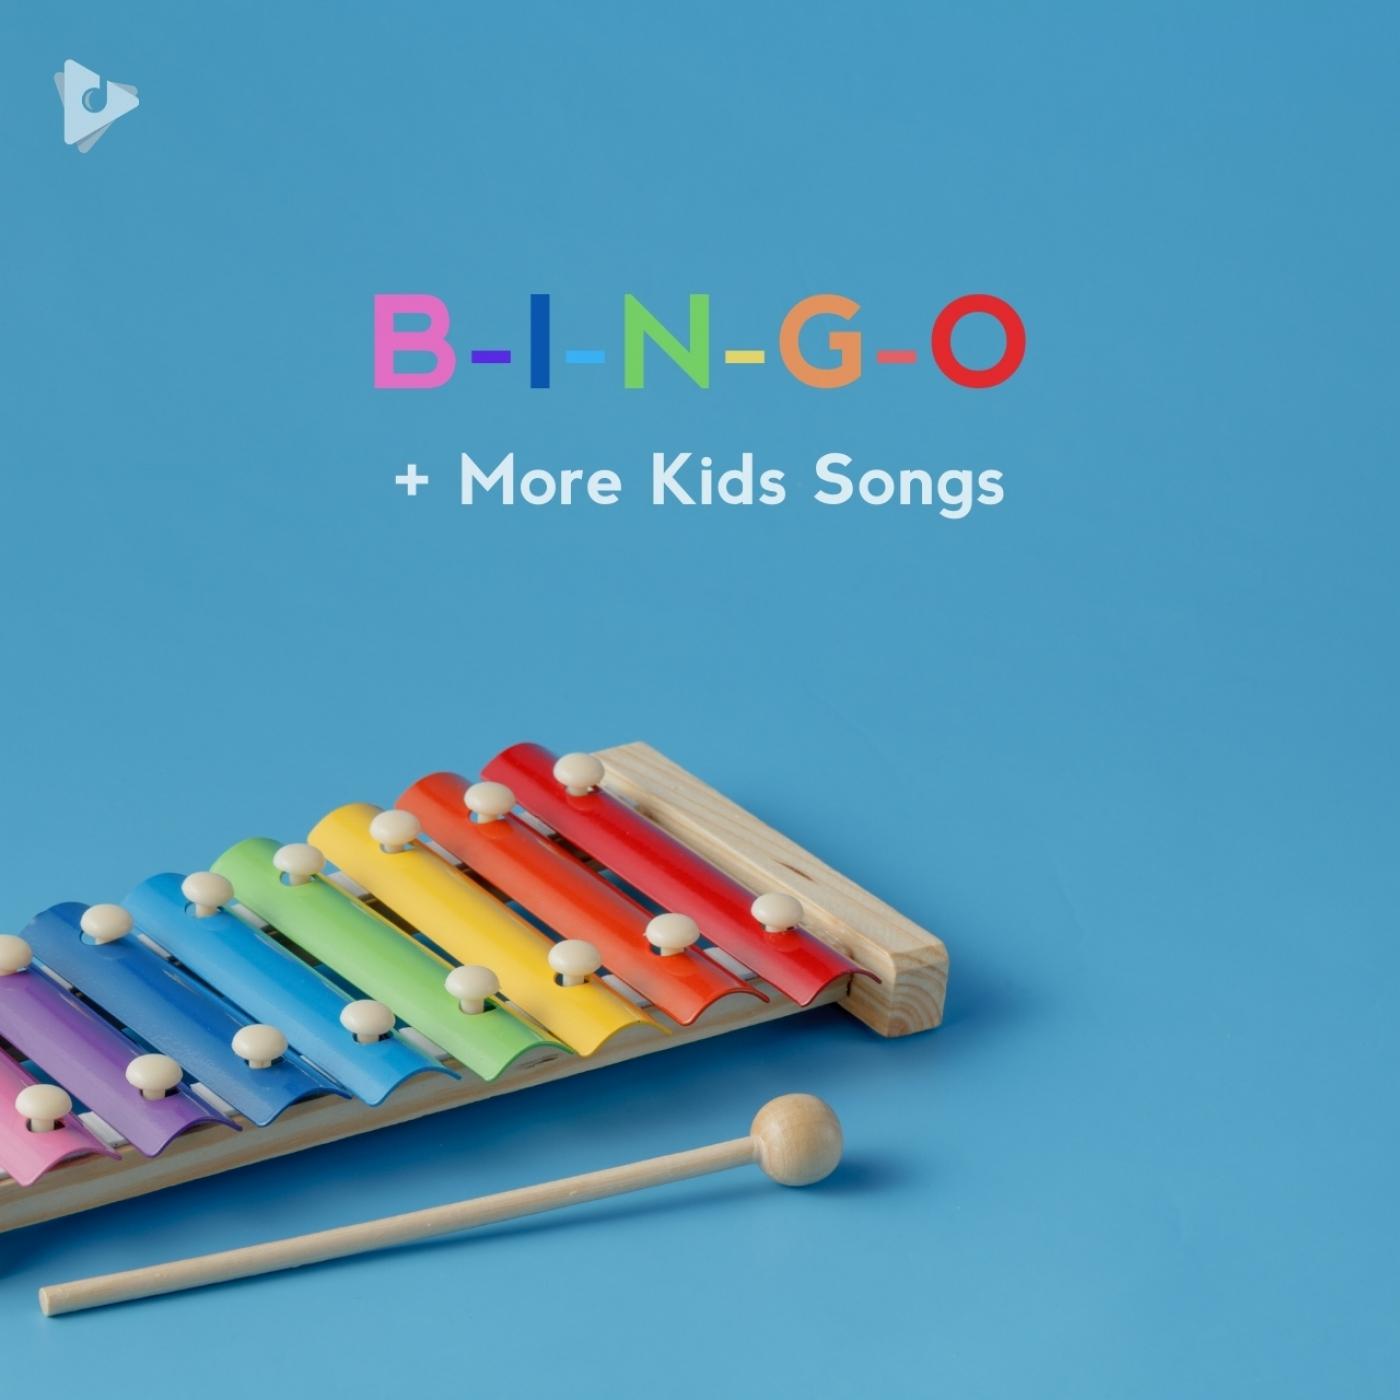 B-I-N-G-O + More Kids Songs